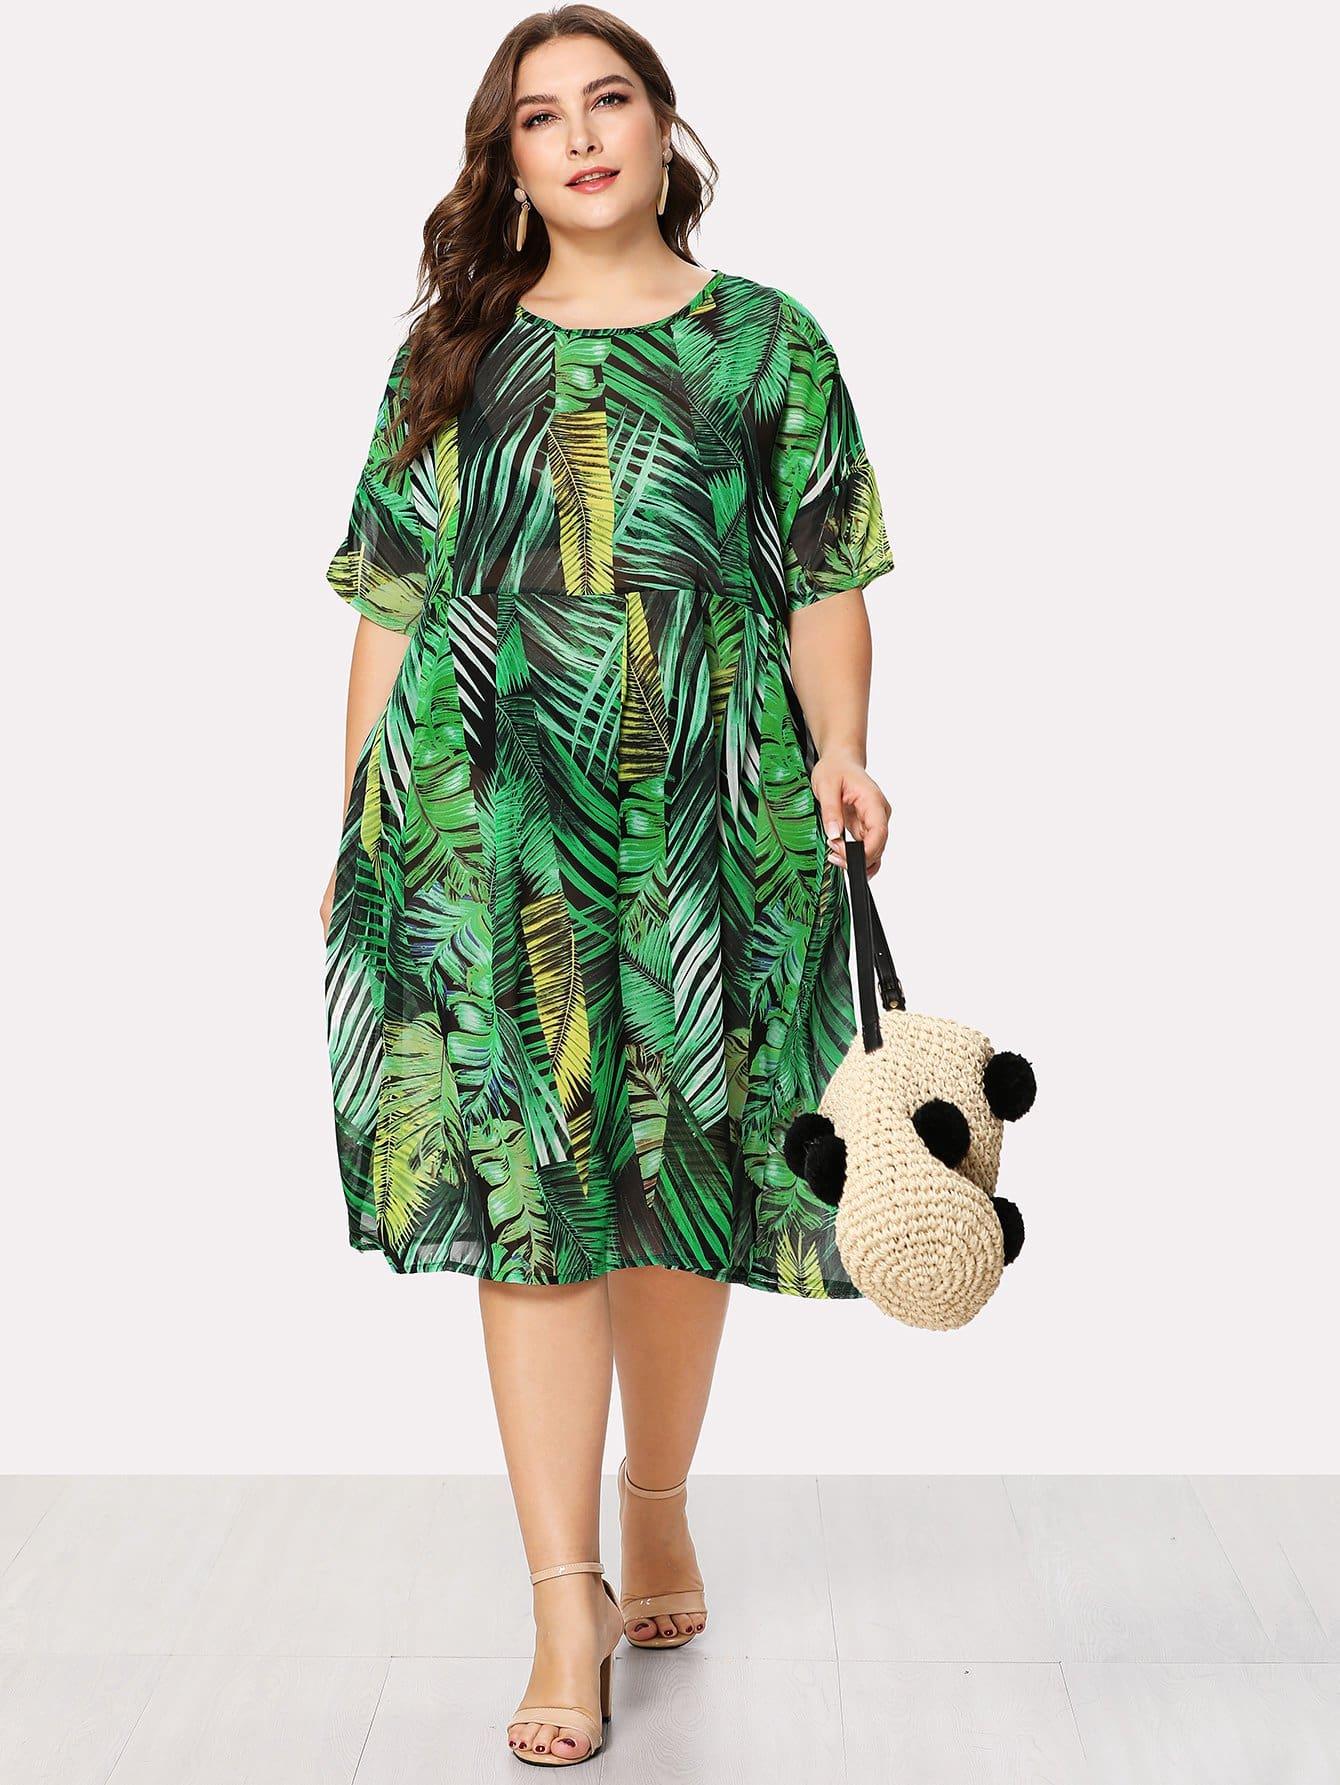 Tropic Print Dress